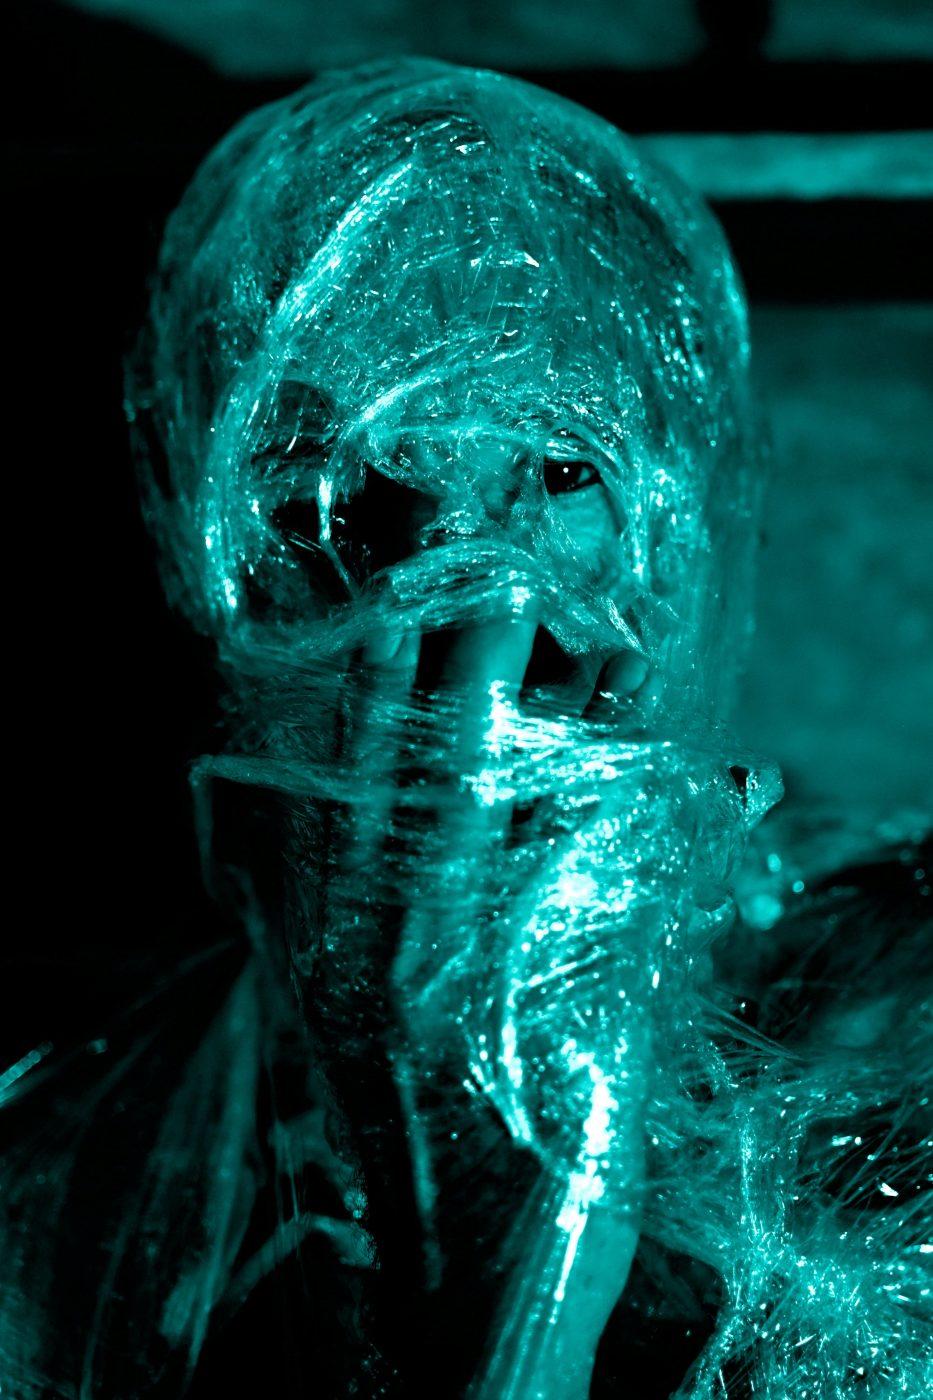 The-plastik-world-n°4-by-Laura-Malaterra-17c5fac2220d4359b866877c0a166304